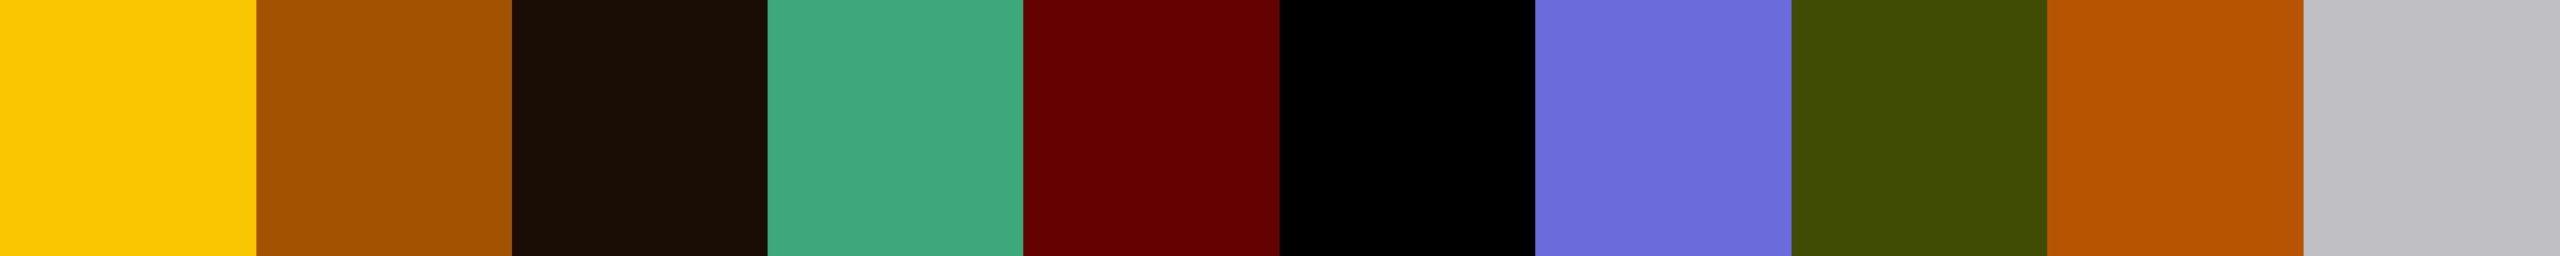 409 Nertiwa Color Palette